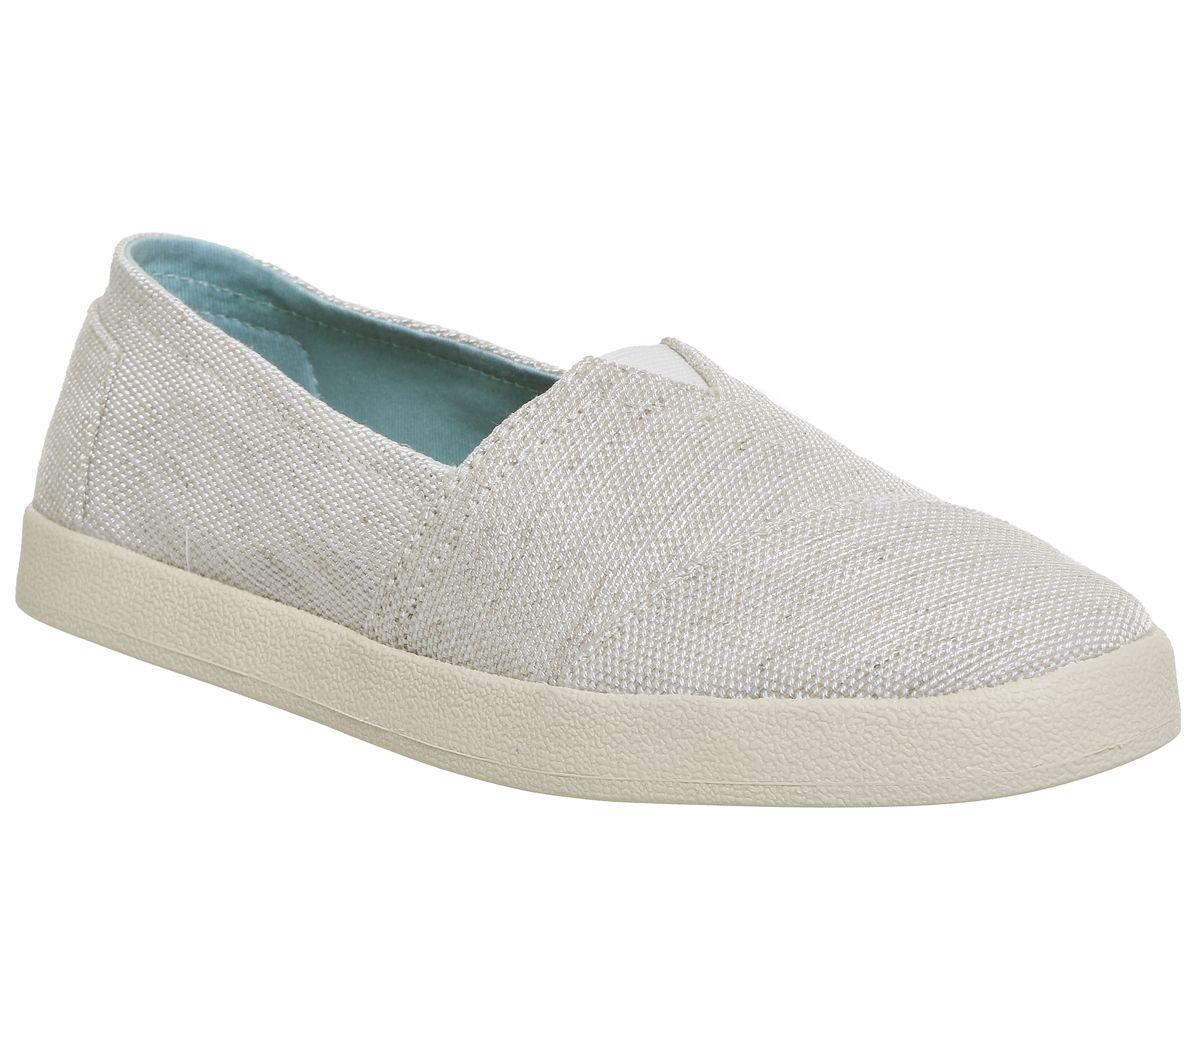 Womens-Toms-Avalon-Sneakers-Natural-Yarn-Dye-Flats thumbnail 4